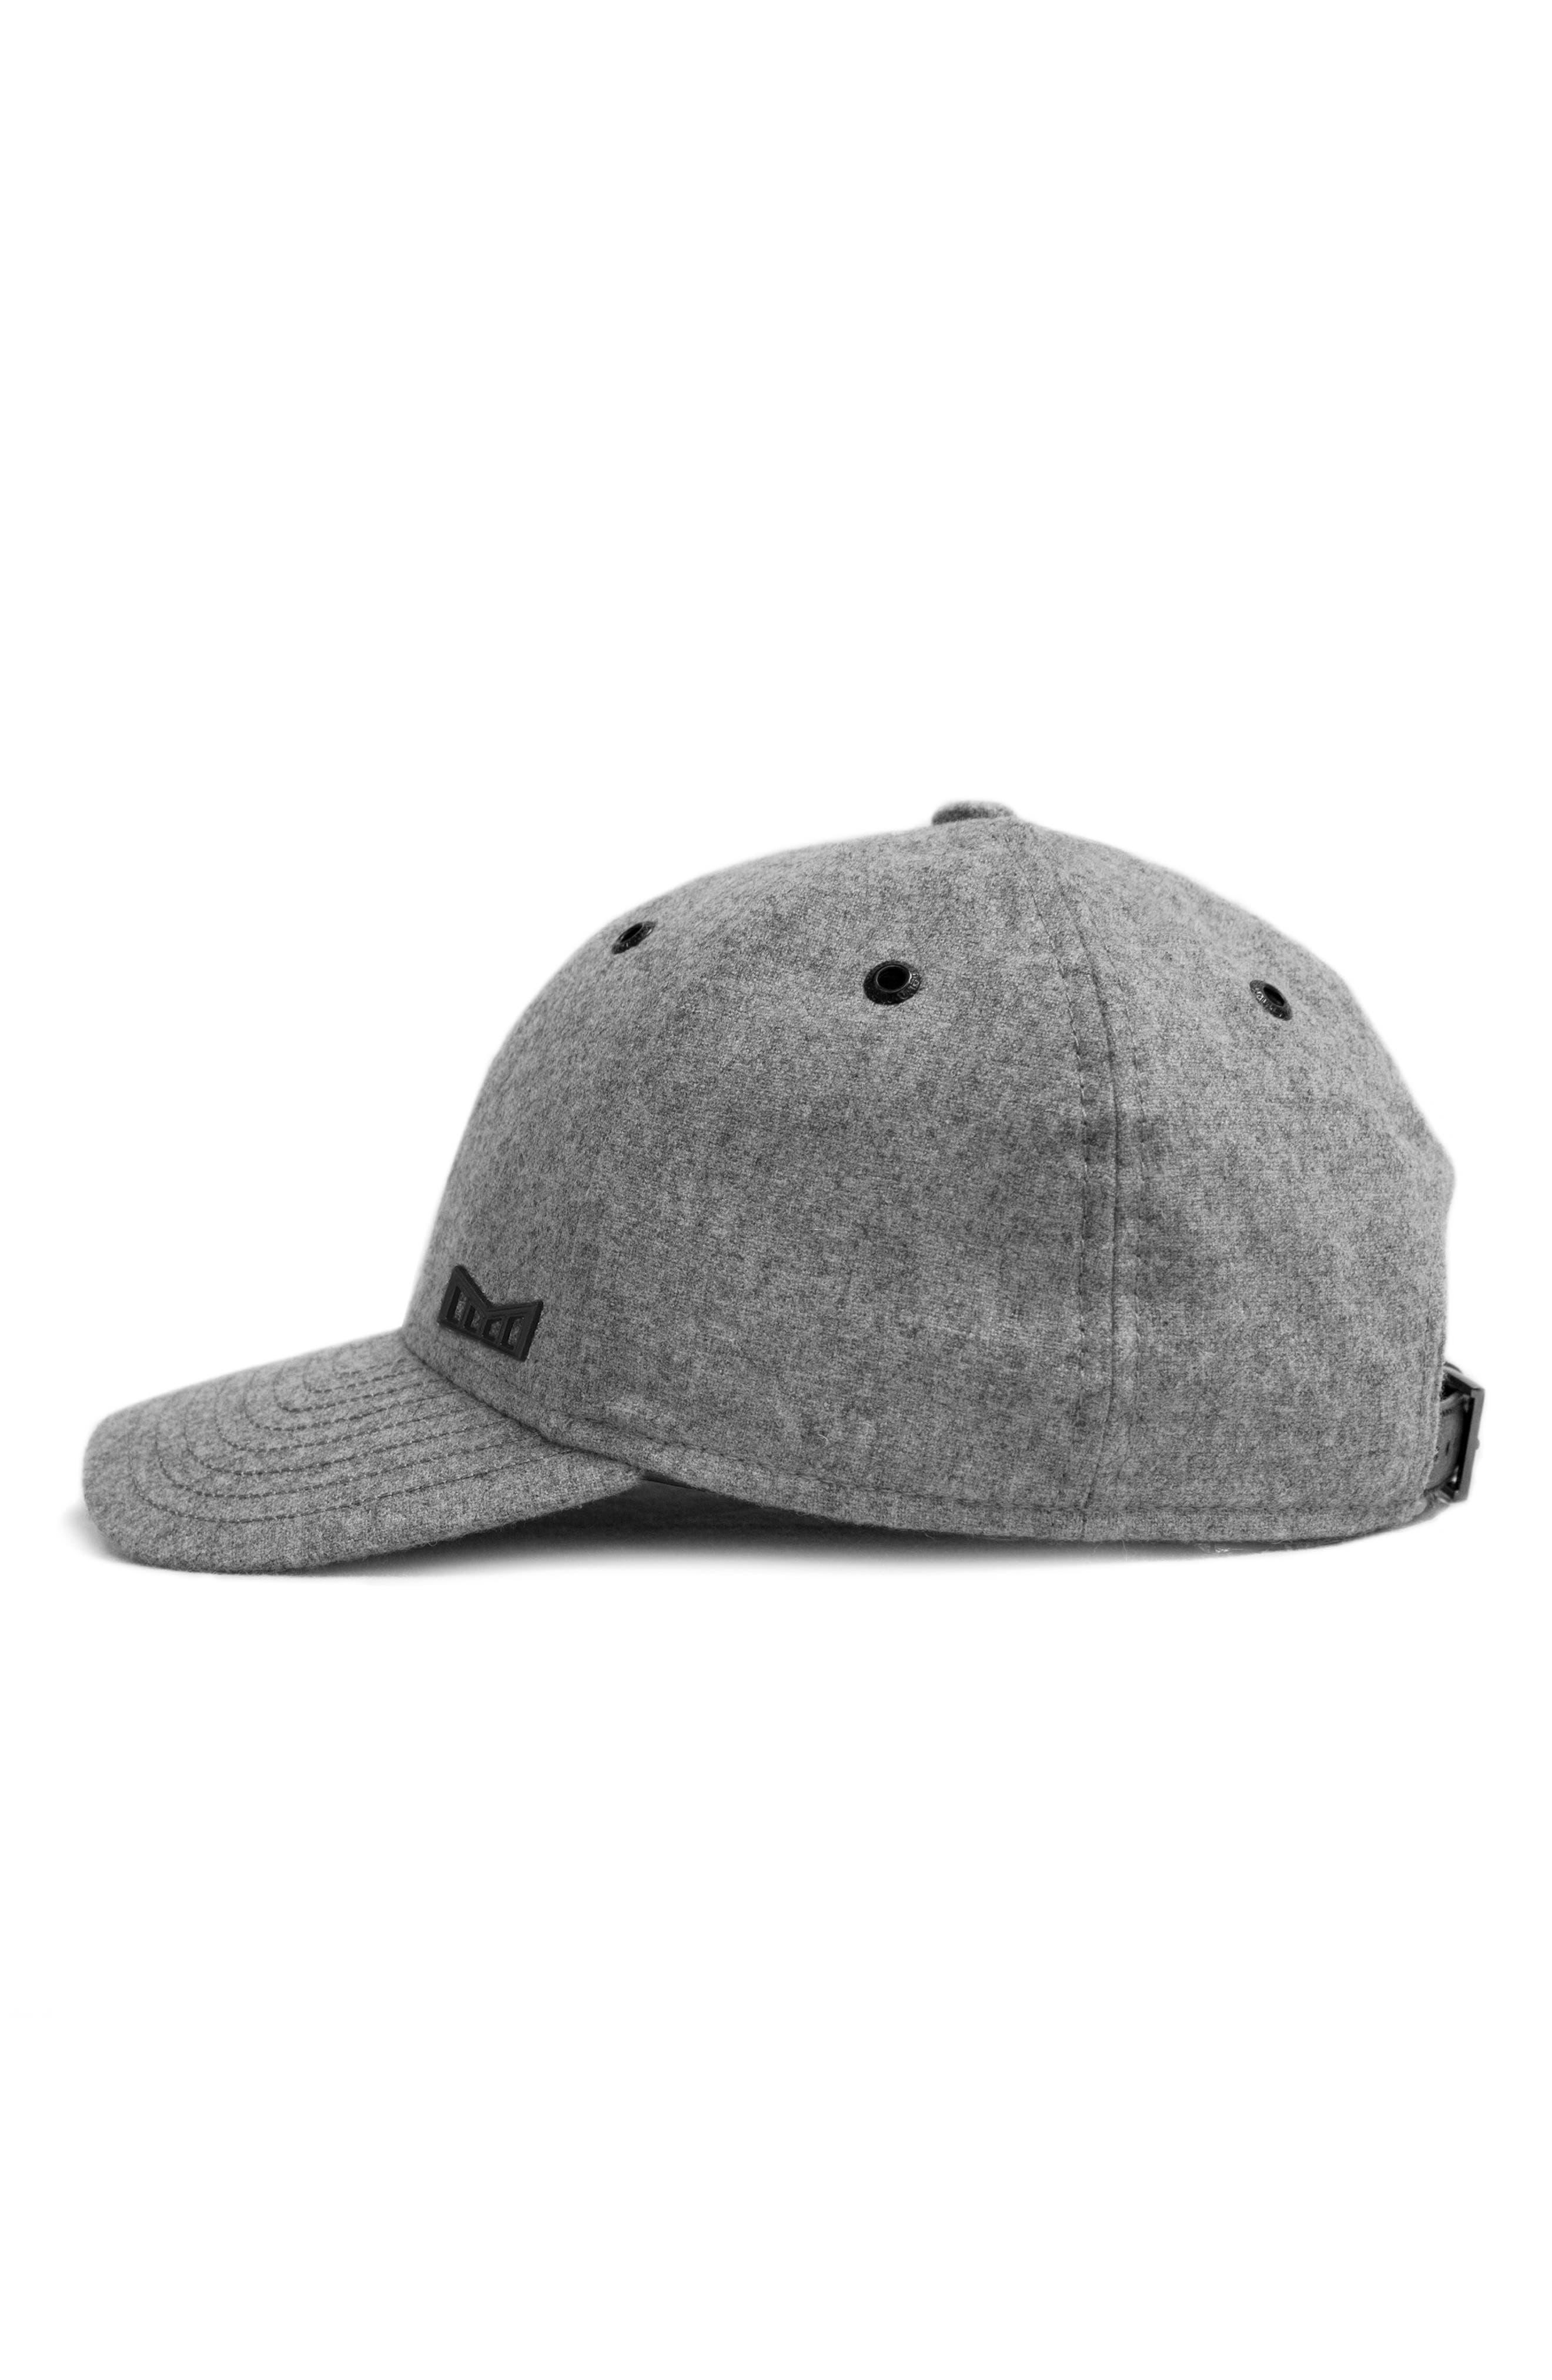 'Glory Days' Strapback Baseball Cap,                             Alternate thumbnail 3, color,                             Gray